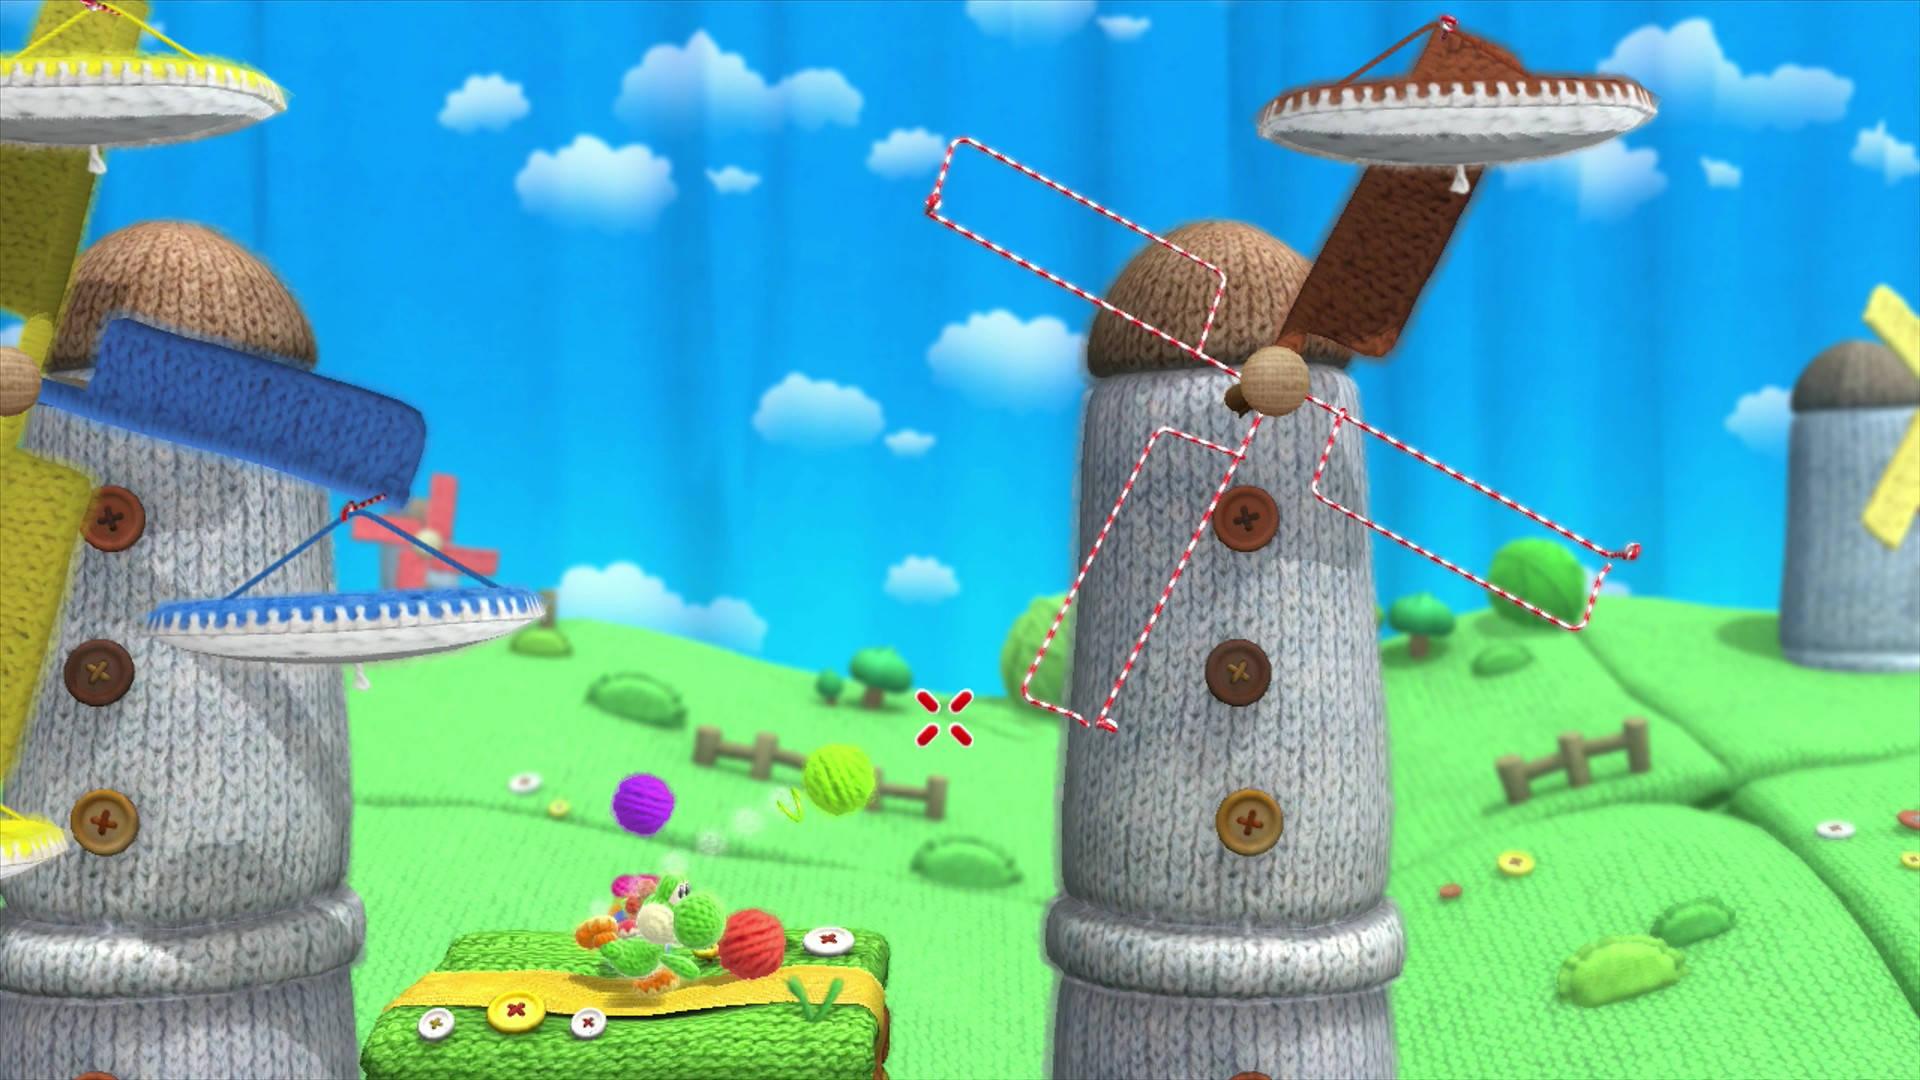 [r] Yoshi's Woolly World 2